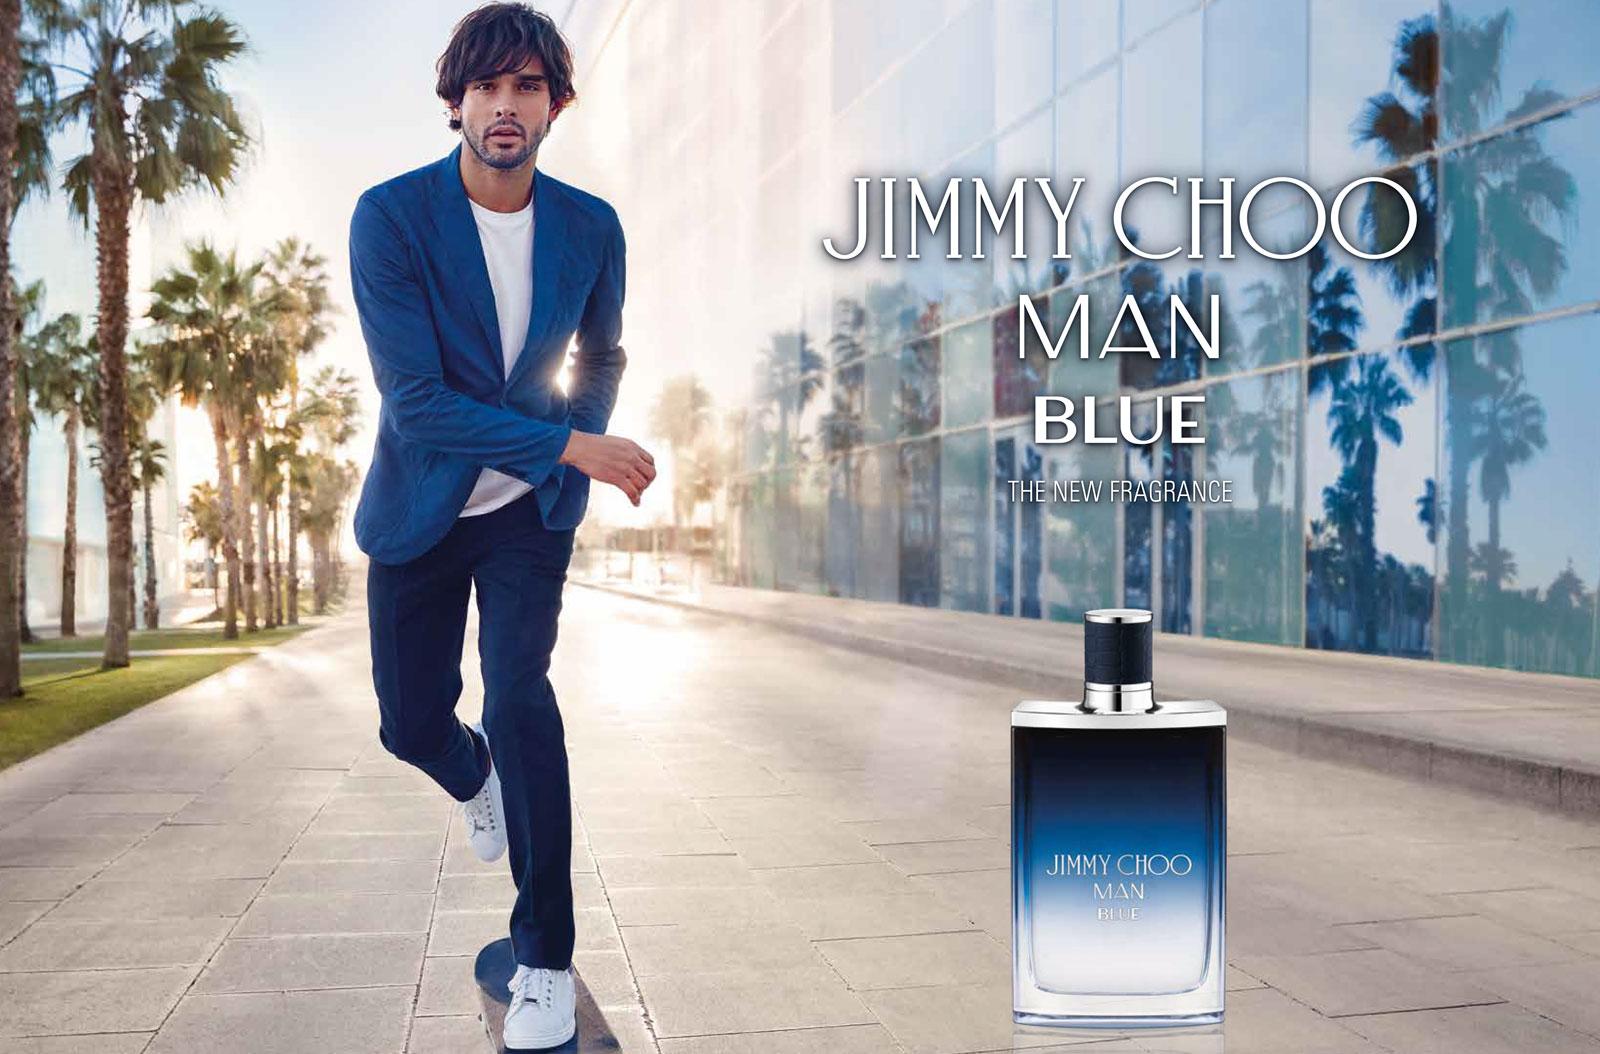 jimmy-choo-man-blue-g1